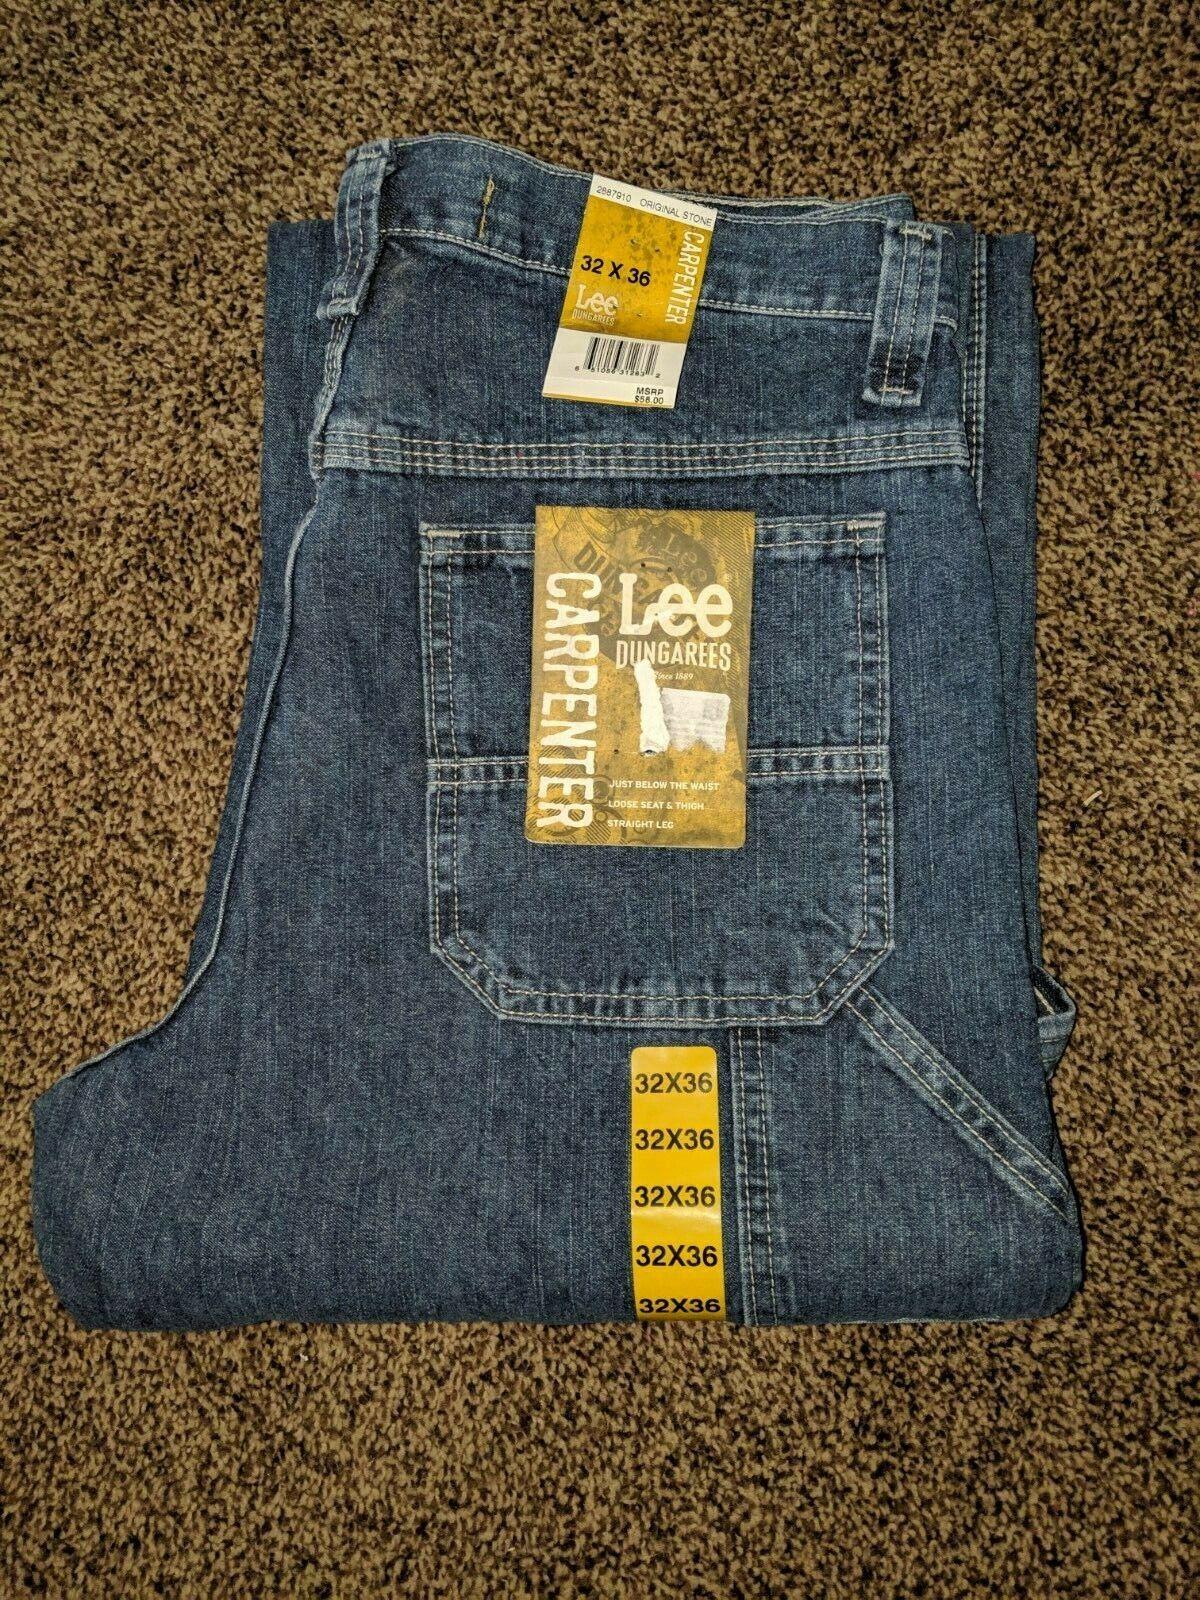 Lee Dungarees Men's Carpenter Jeans